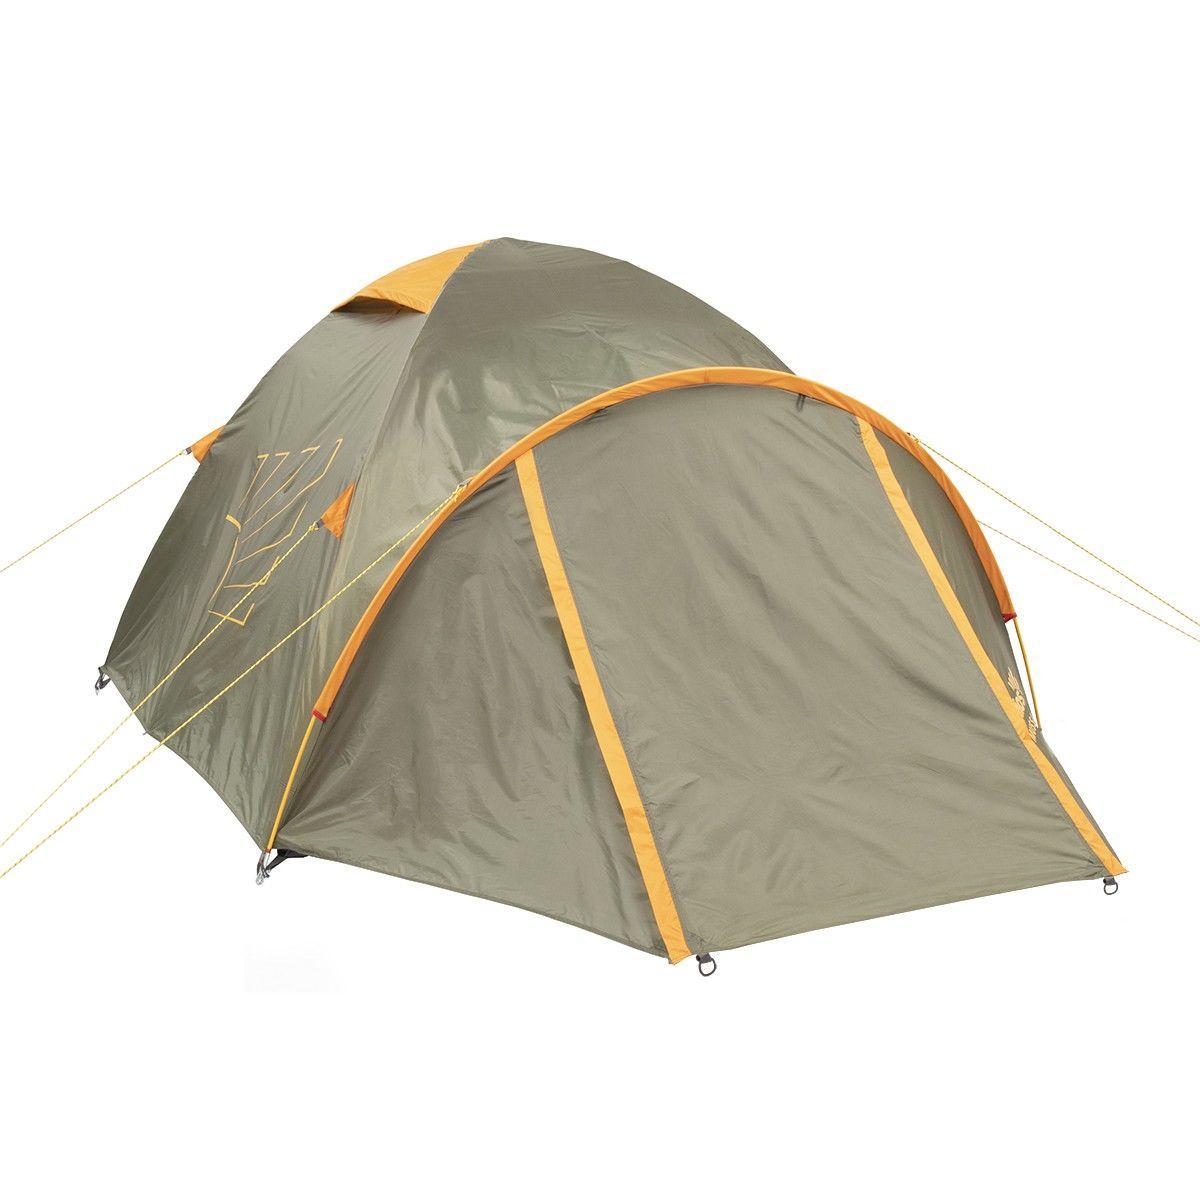 Палатка MUSSON-3 Helios зеленый-оранжевый HS-2366-3 GO - фото 3